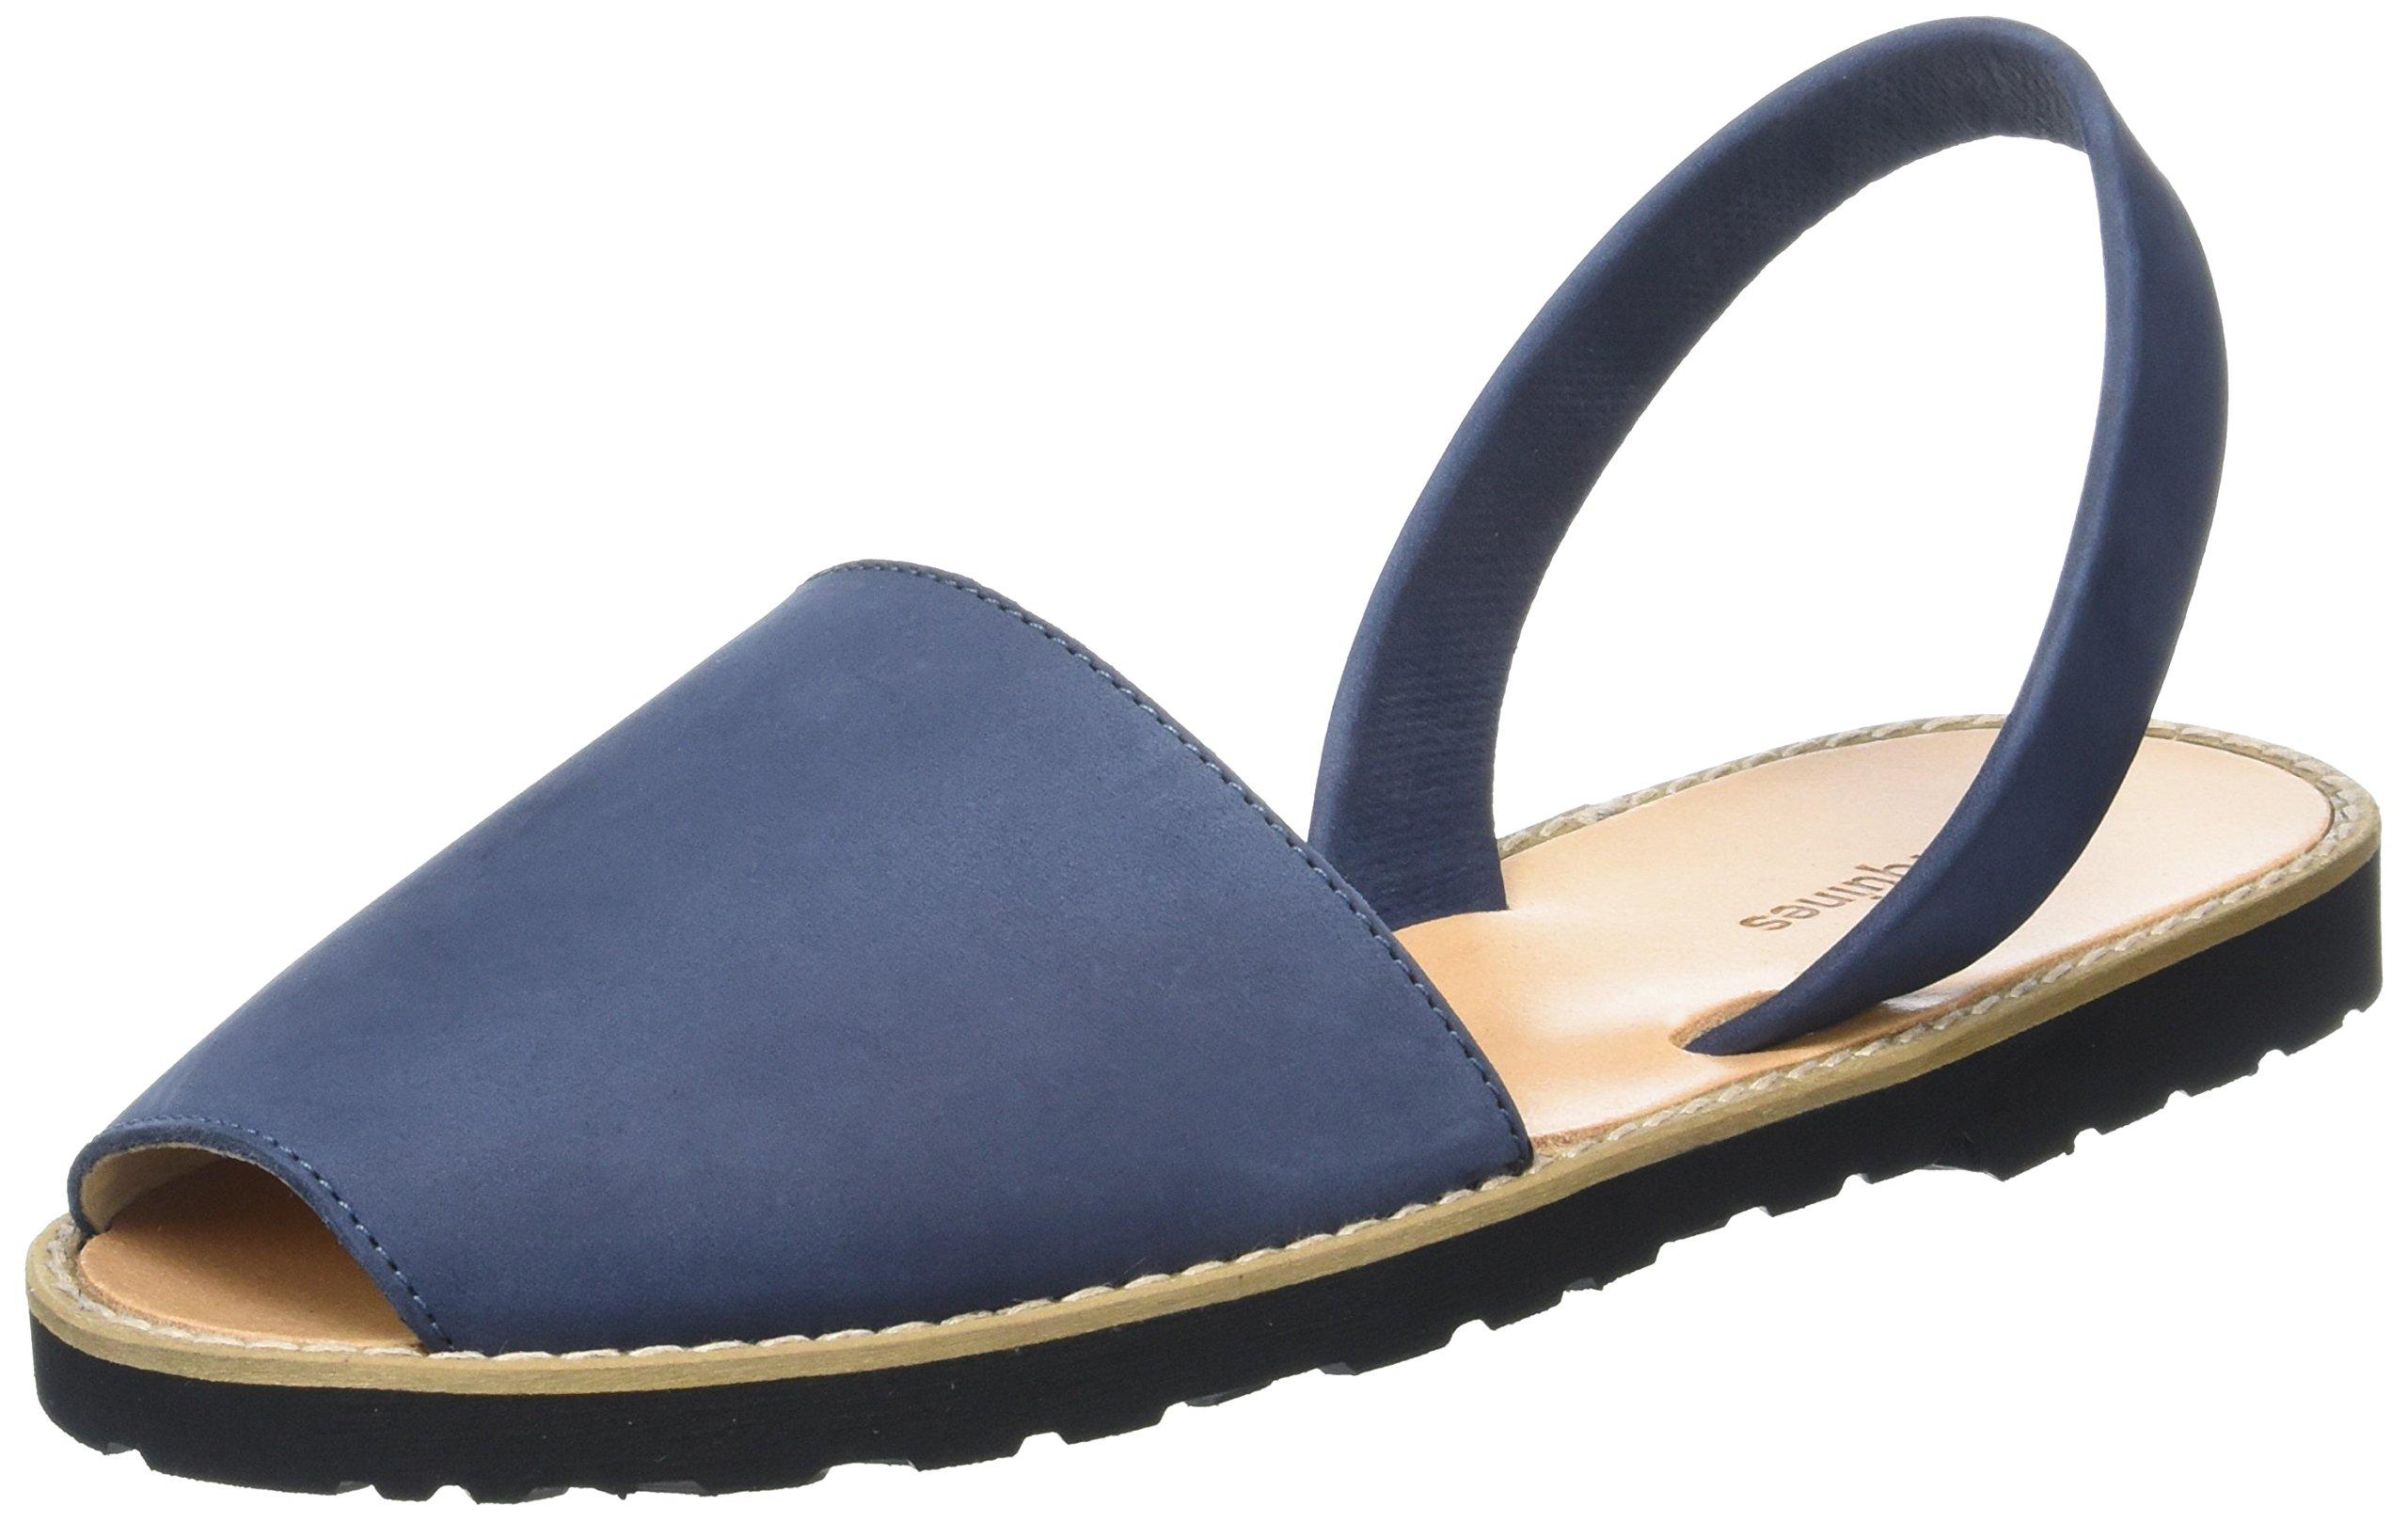 Minorquines Men S Avarca Sling Back Sandals Buy Online In Andorra At Andorra Desertcart Com Productid 190808511